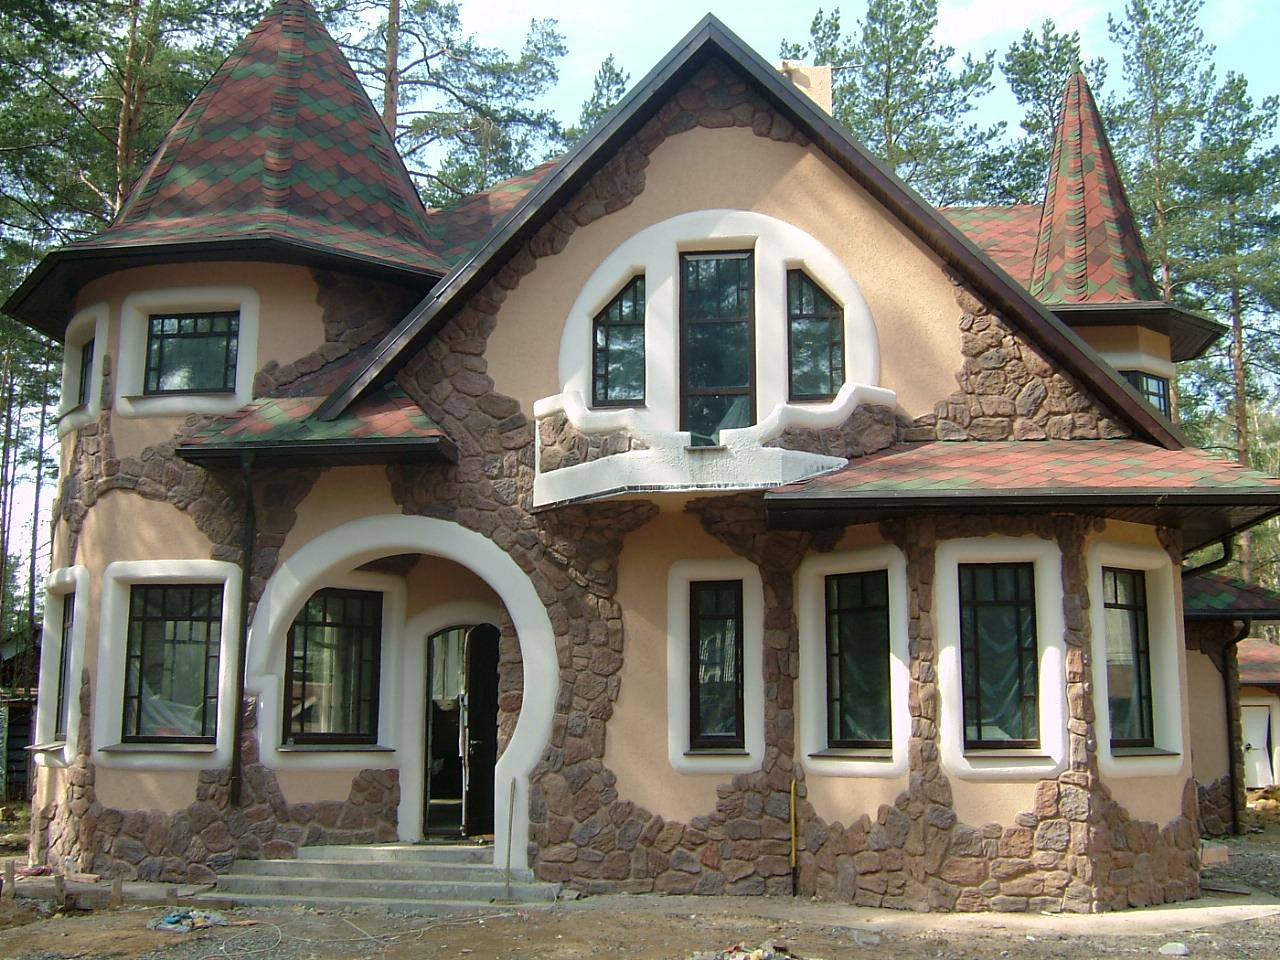 Декор дома фасадными панелями из камня